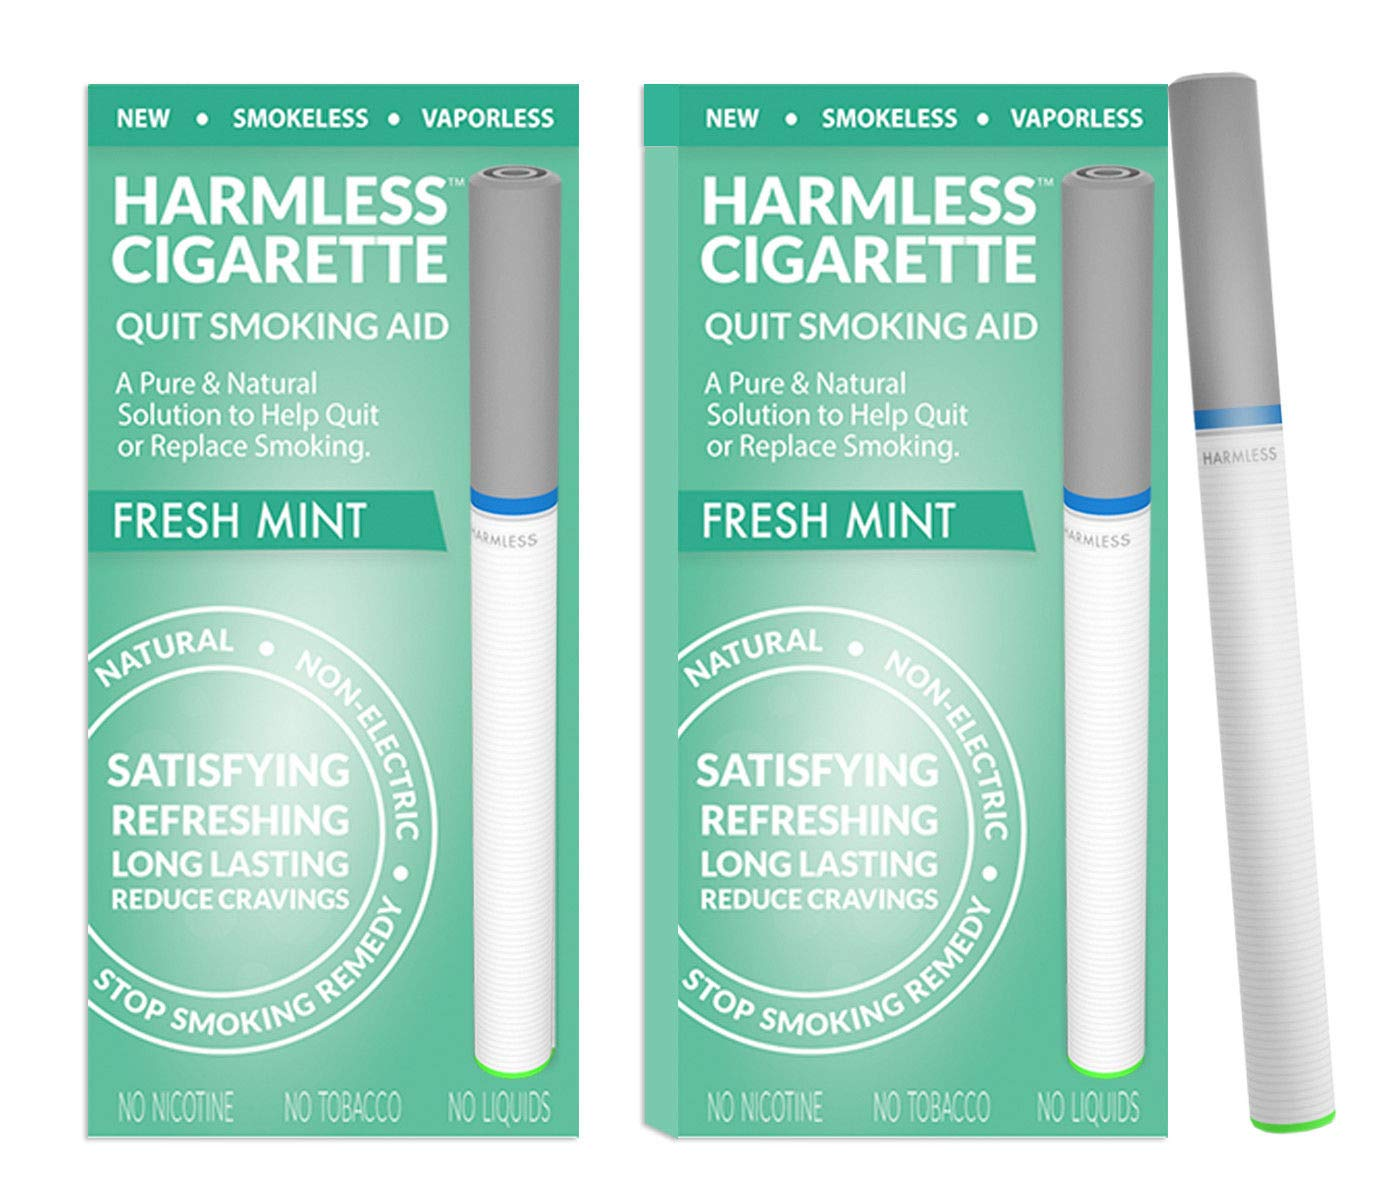 Harmless Stop Smoking Aid - 4 Week Quit Kit - Stop Smoking Aid - Includes Free Quit Smoking Support Guide.(Fresh Mint, 2 Pack)